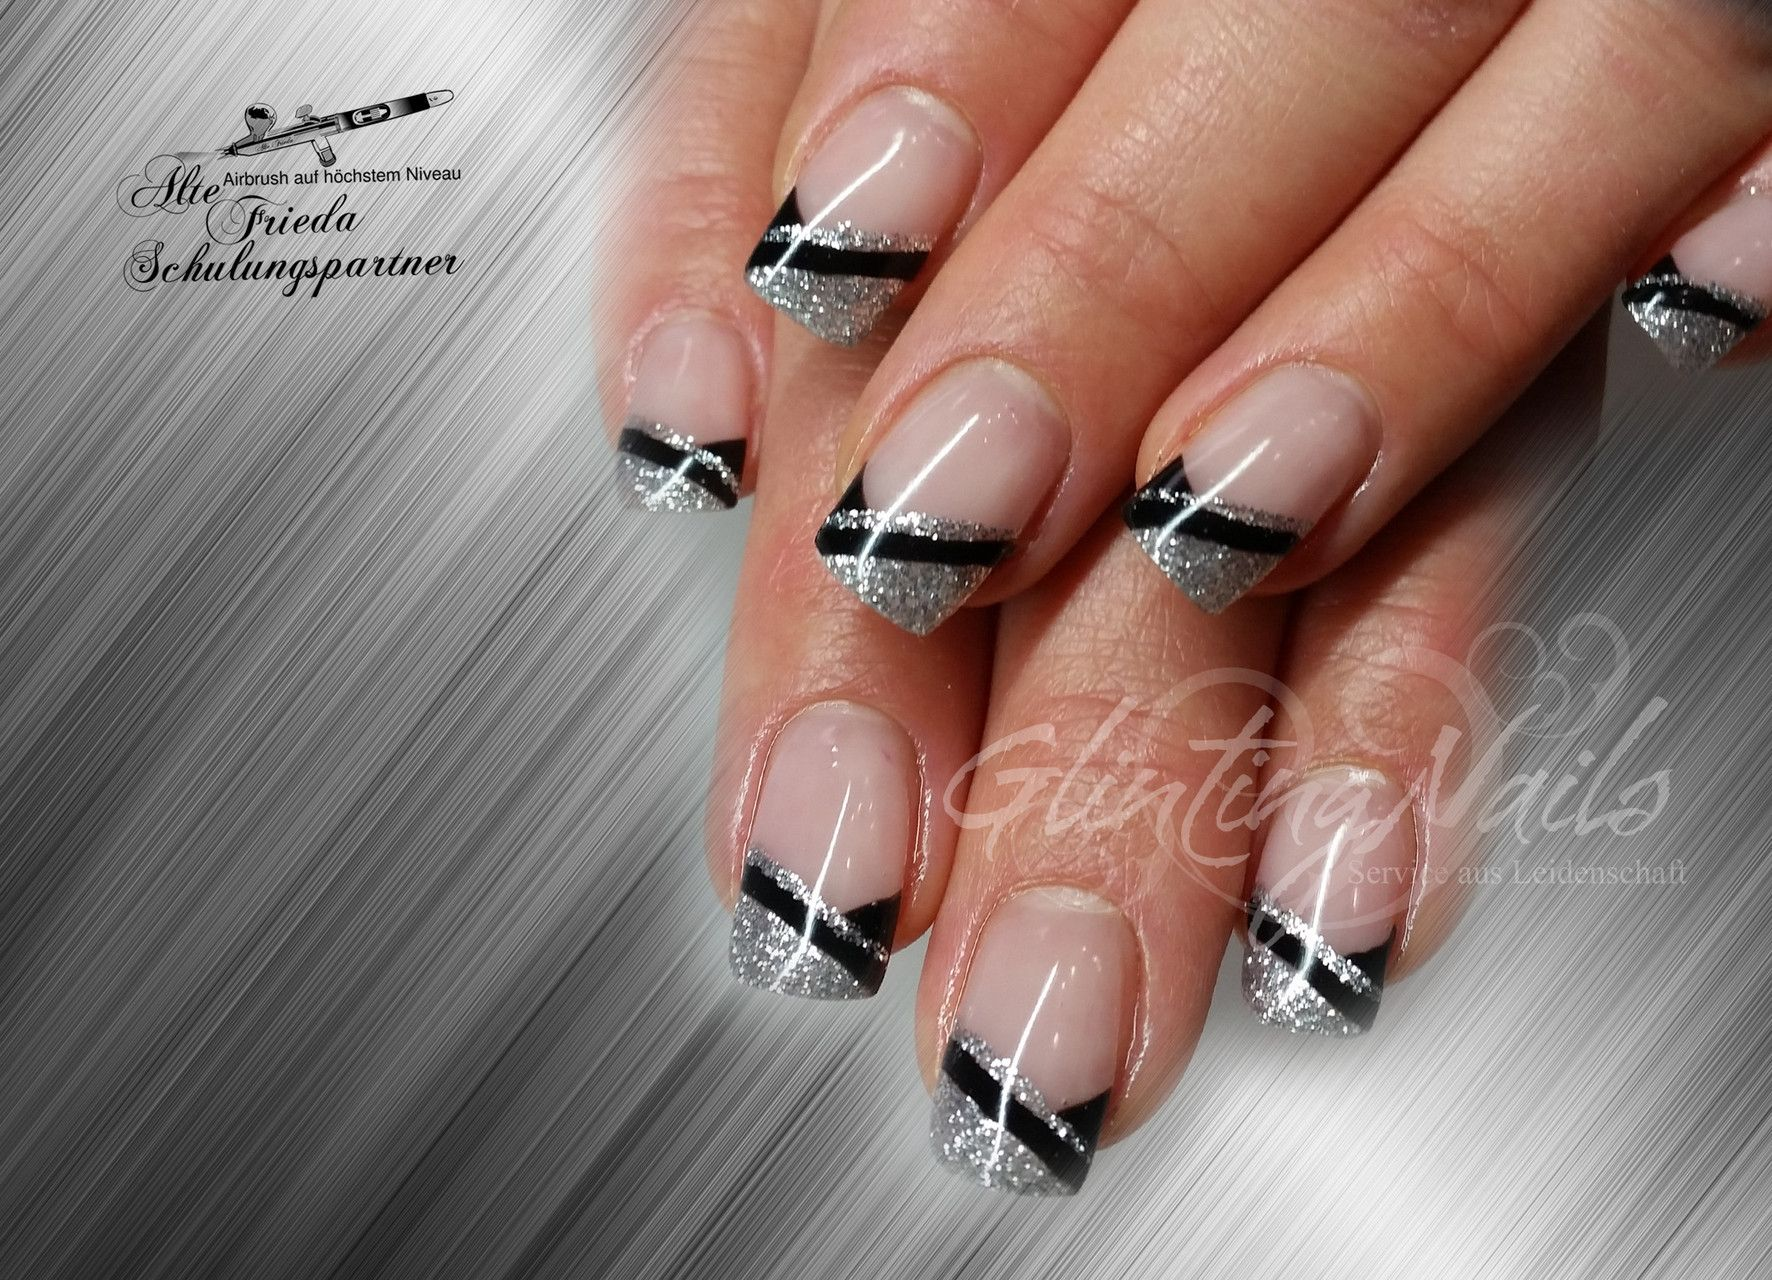 Colored french nail design - Http Www Glinting Nails De Bildergalerie French